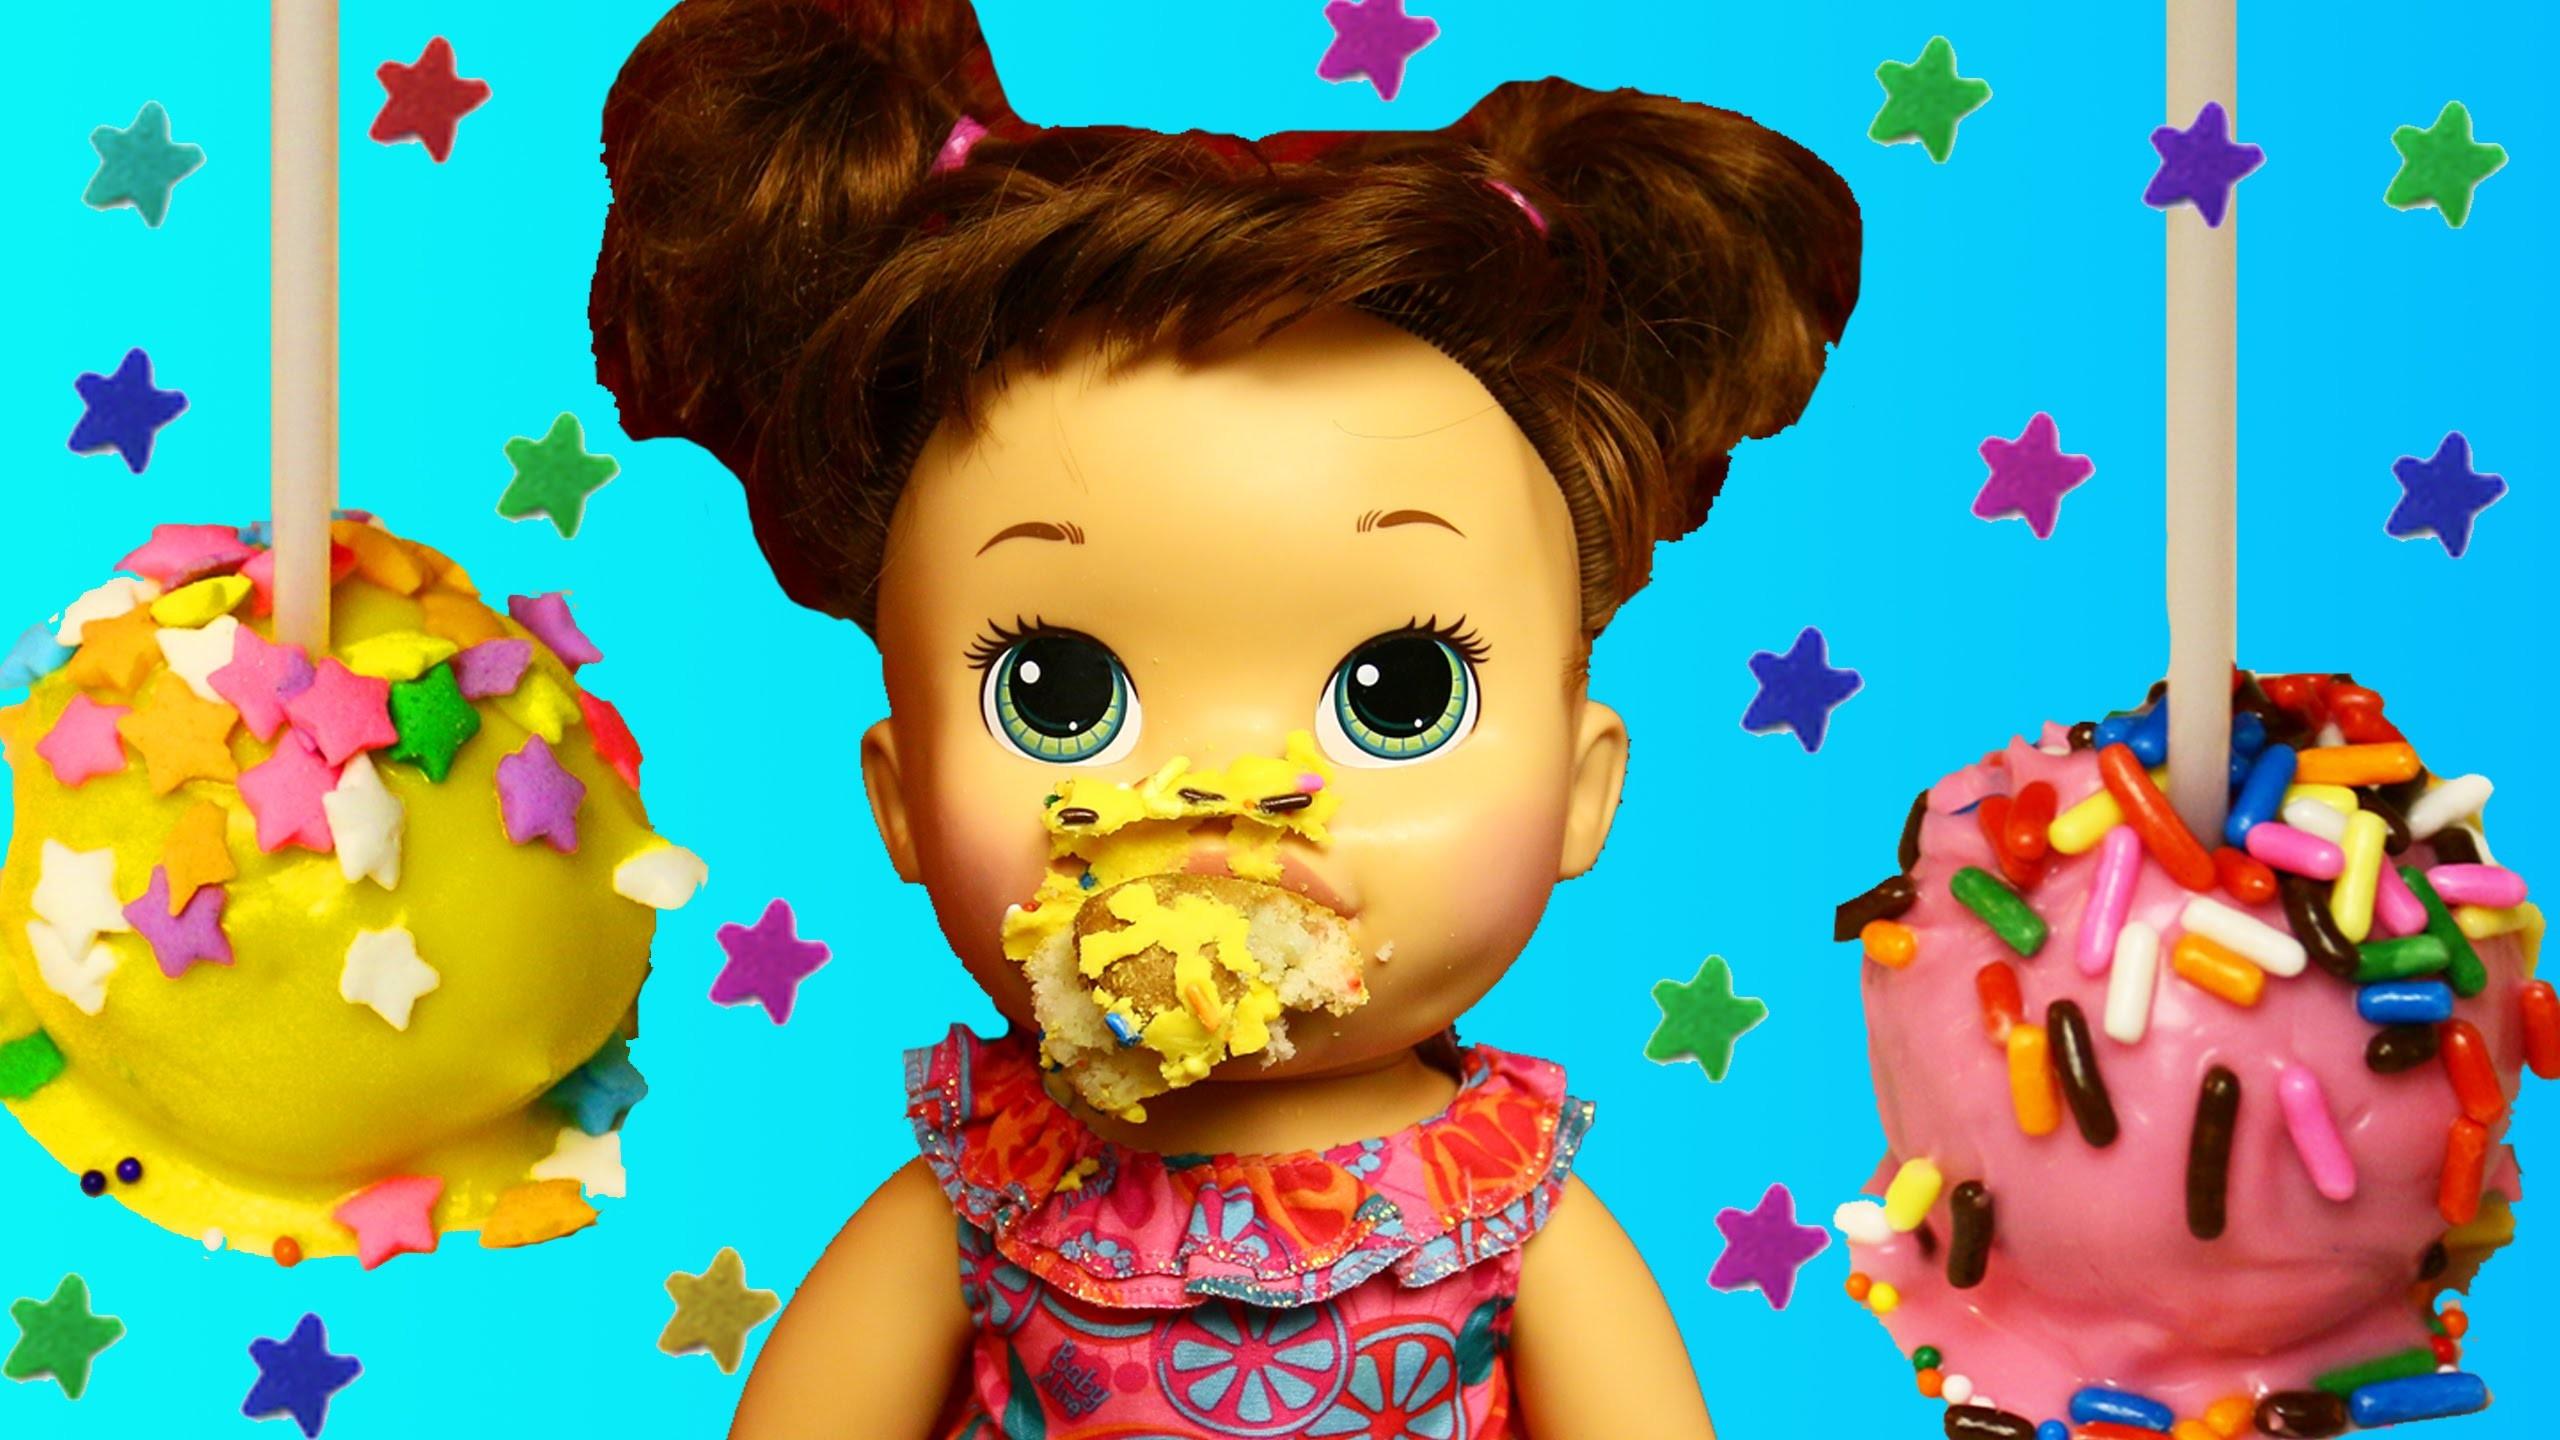 Baby Alive Dolls Makes CAKE POPS With DIY Cake Maker + Chocolate & Sprinkles DisneyCarToys